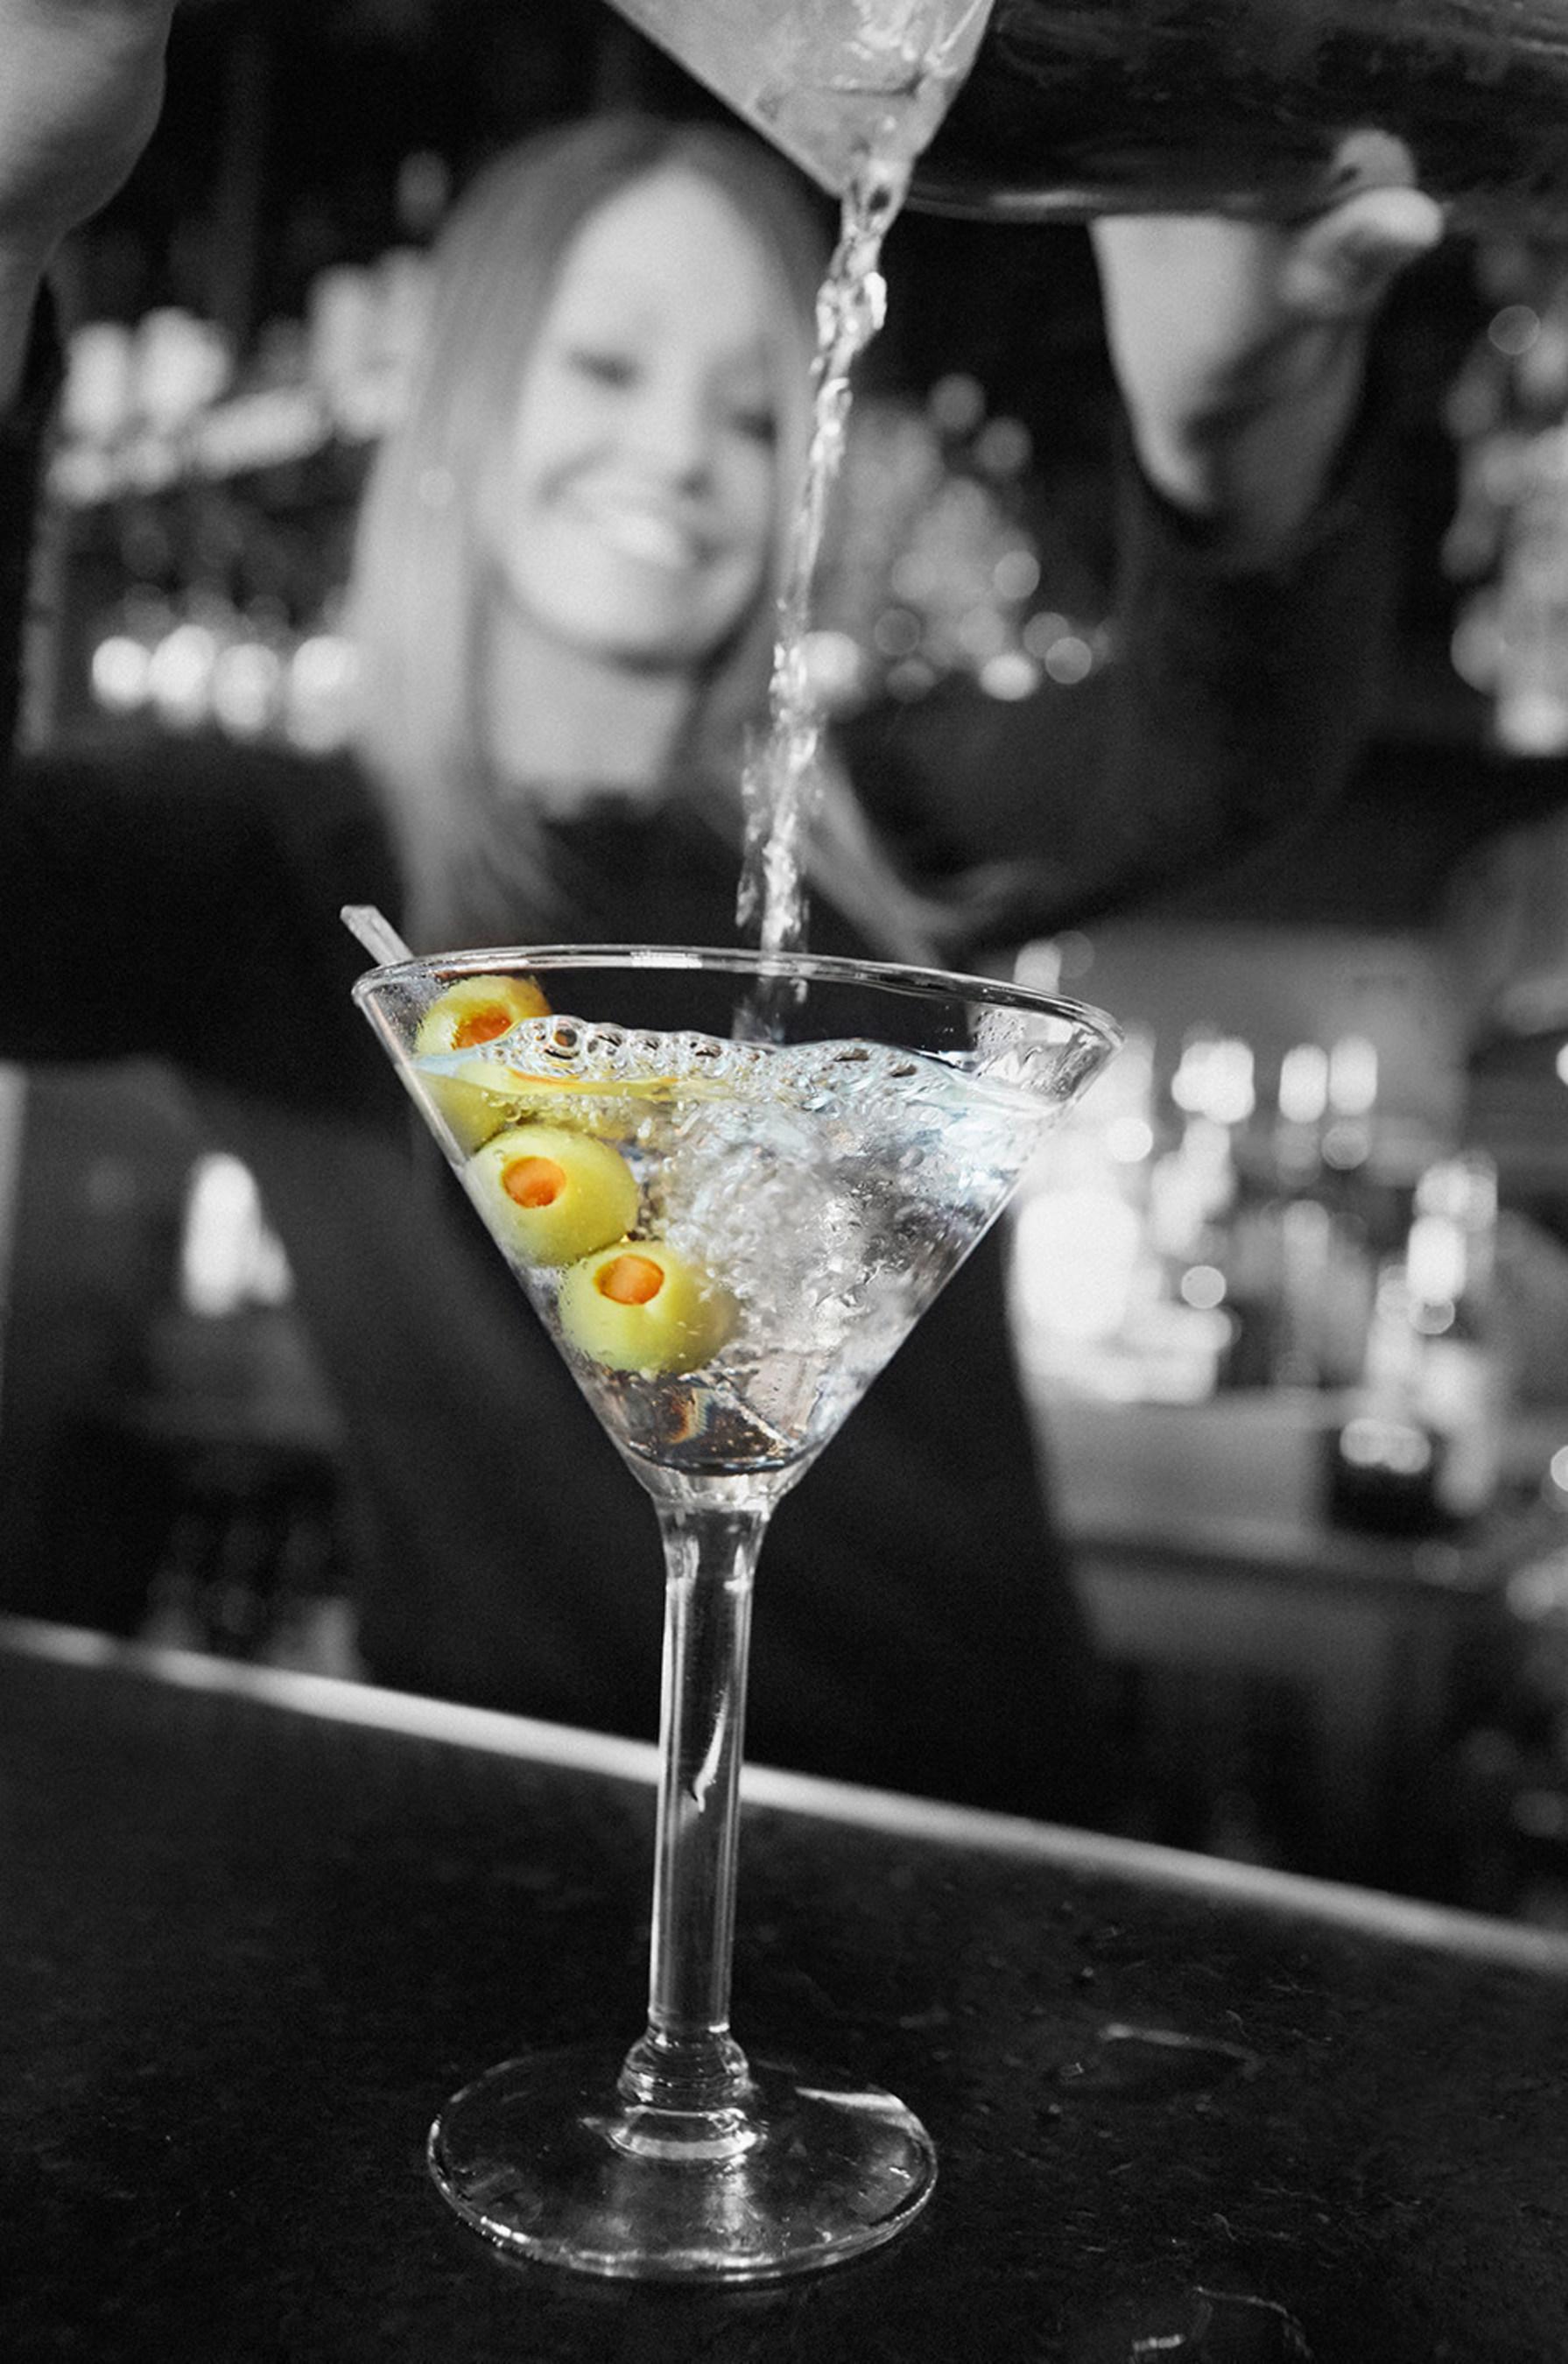 Bar Louie Signature Martini - The Dirty